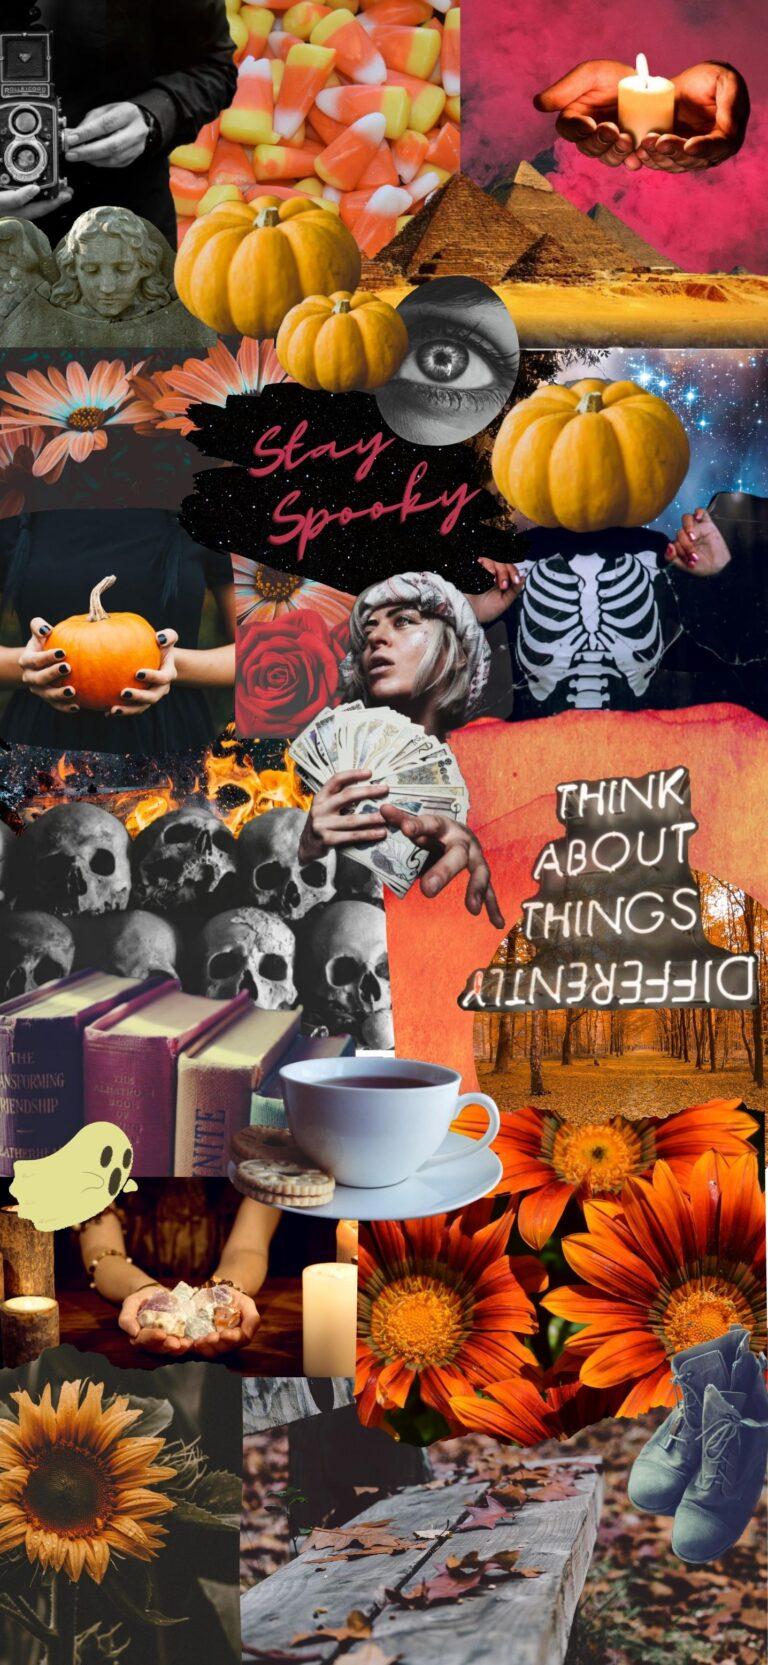 R.L. Stine on Goosebumps: Haunted Halloween, the